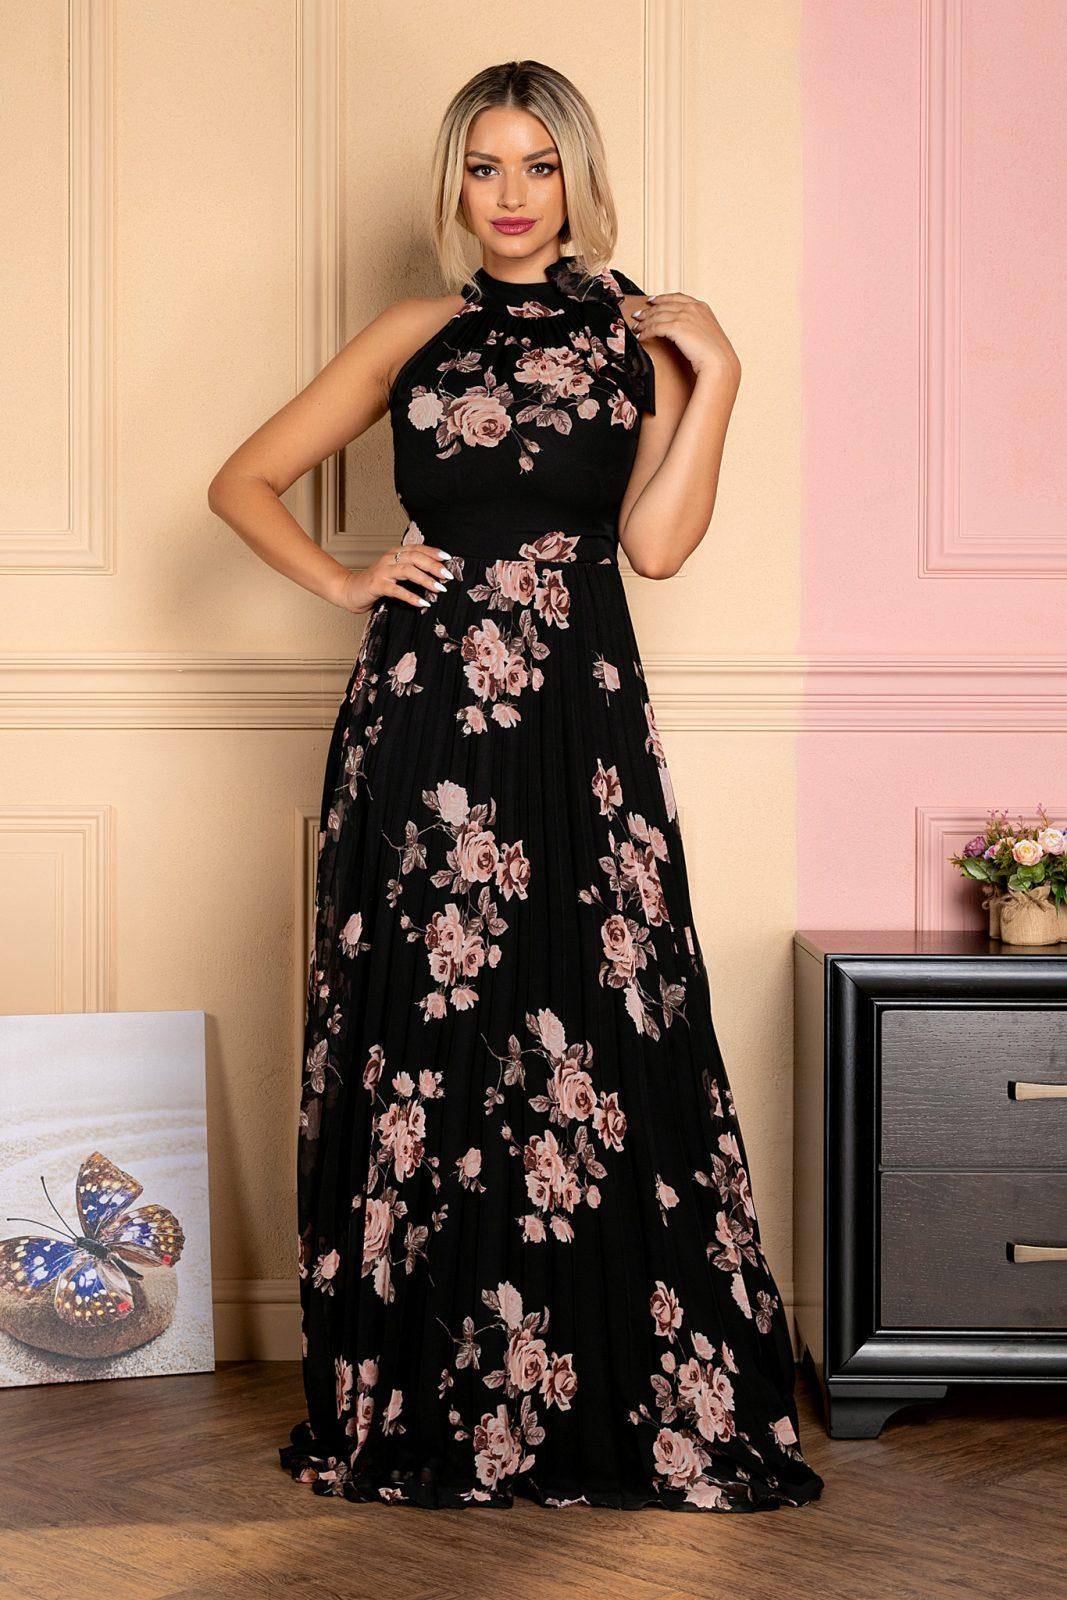 Amarys Floral Dress